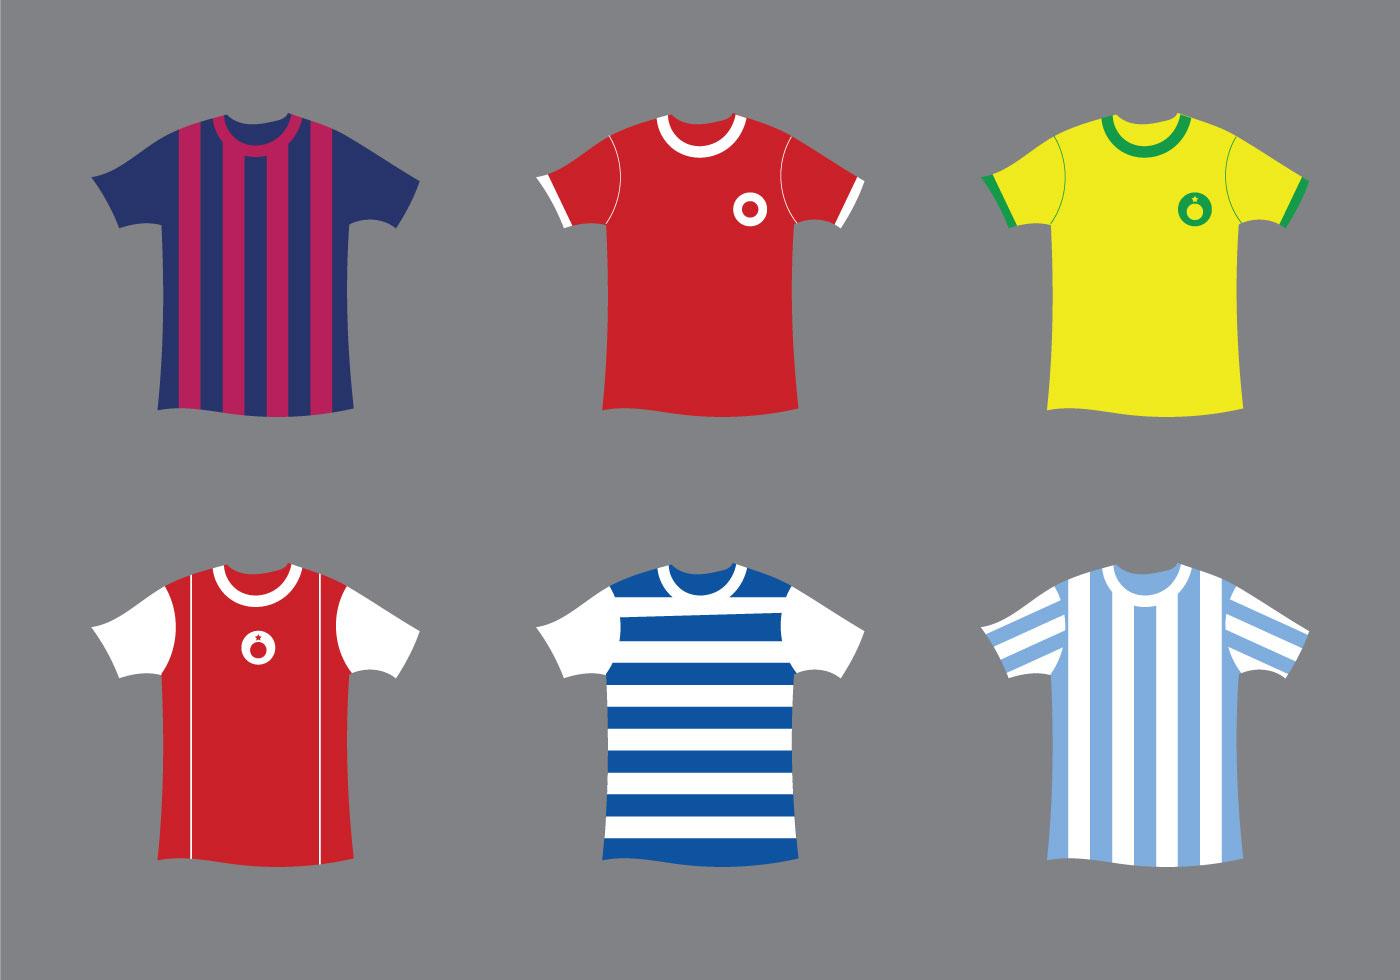 990b93586e1 Free Football kit Vector Illustration - Download Free Vector Art ...